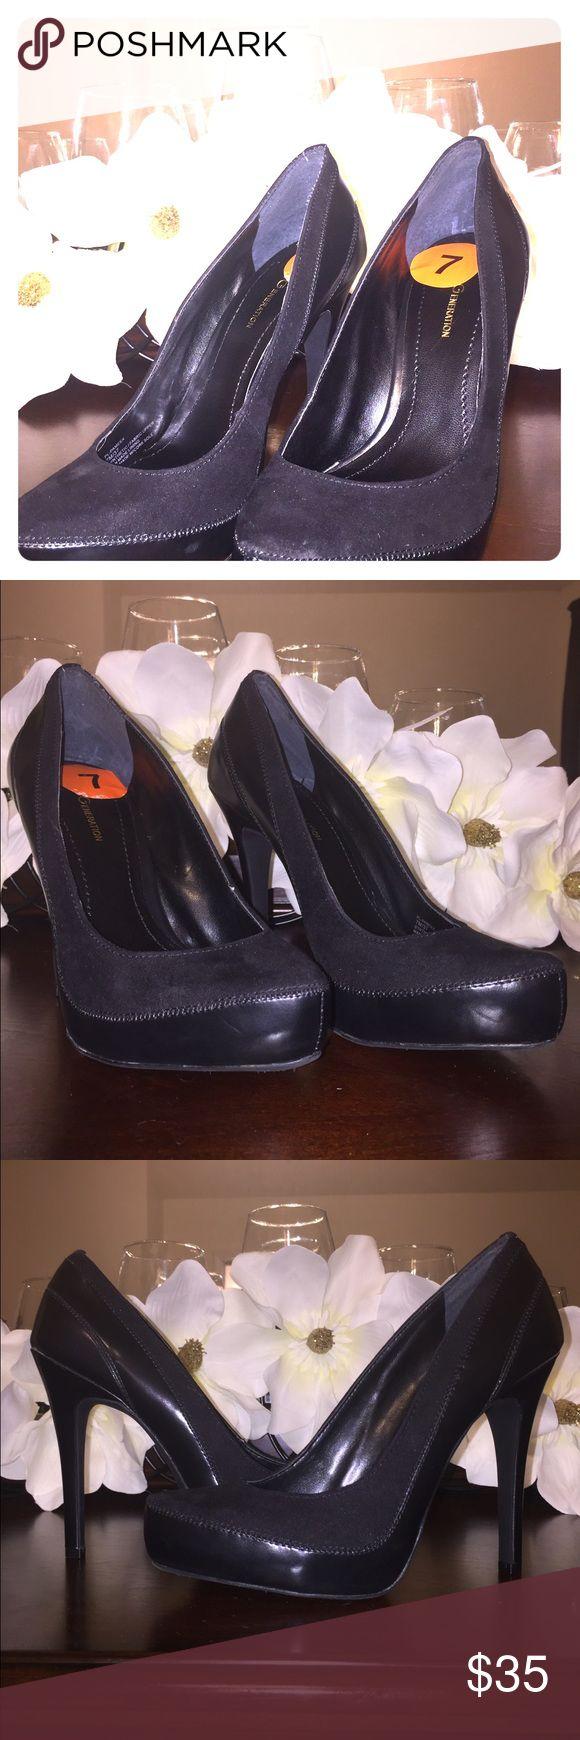 Blk BCBG Generation sz 7, 5 inch heel Blk BCBG Generation sz 7 , 5 inch heel. BCBGeneration Shoes Heels